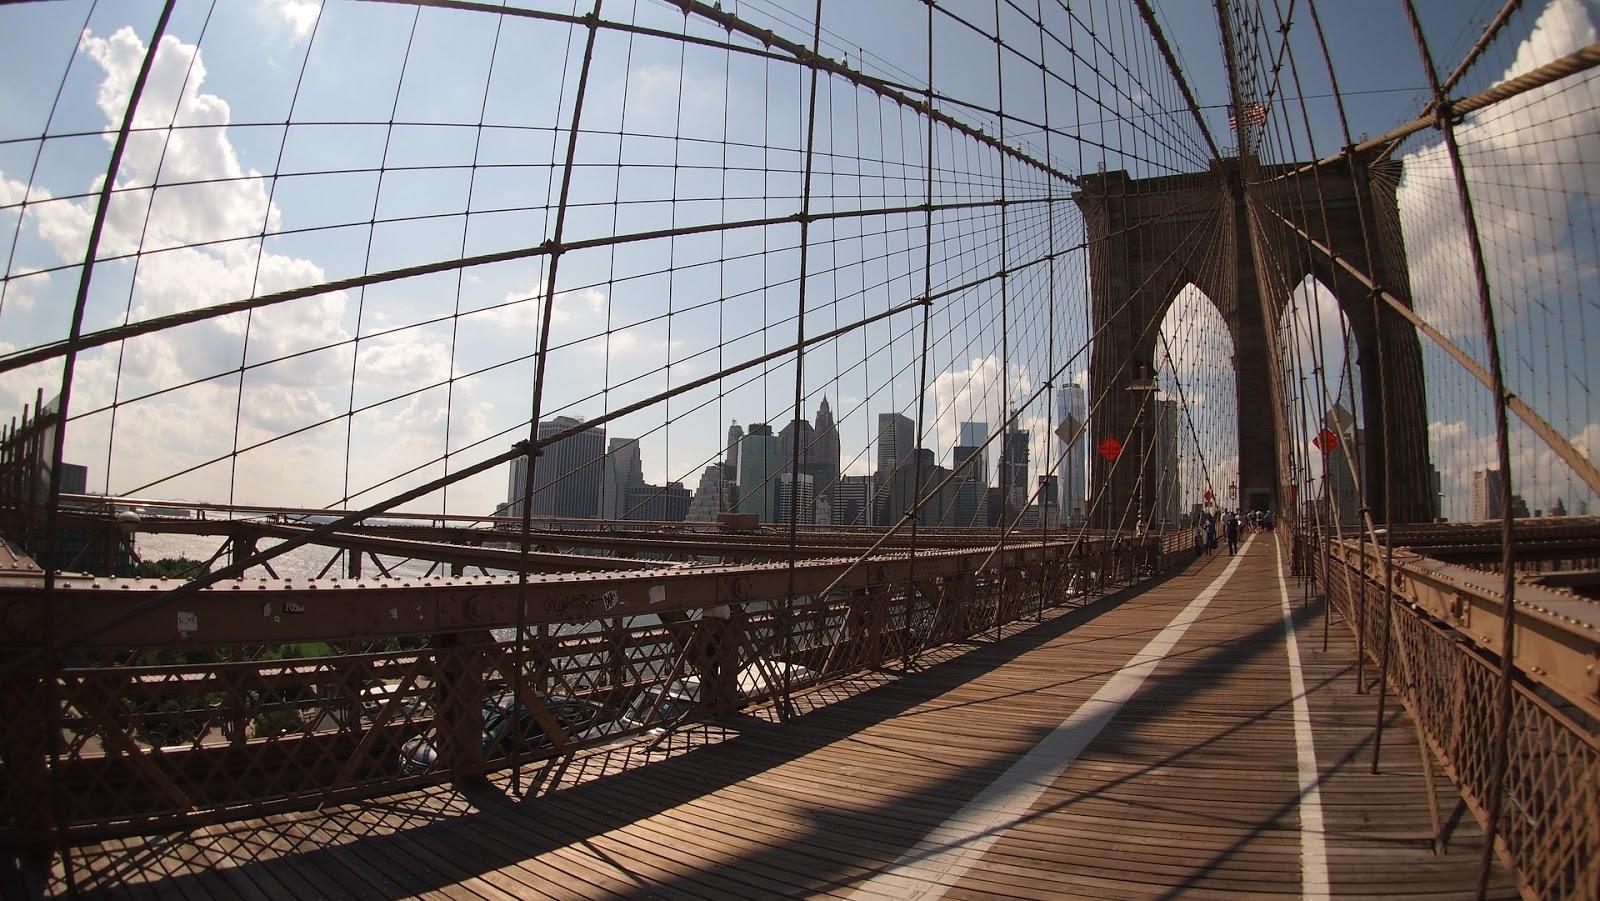 The Brooklyn Bridge, New York USA